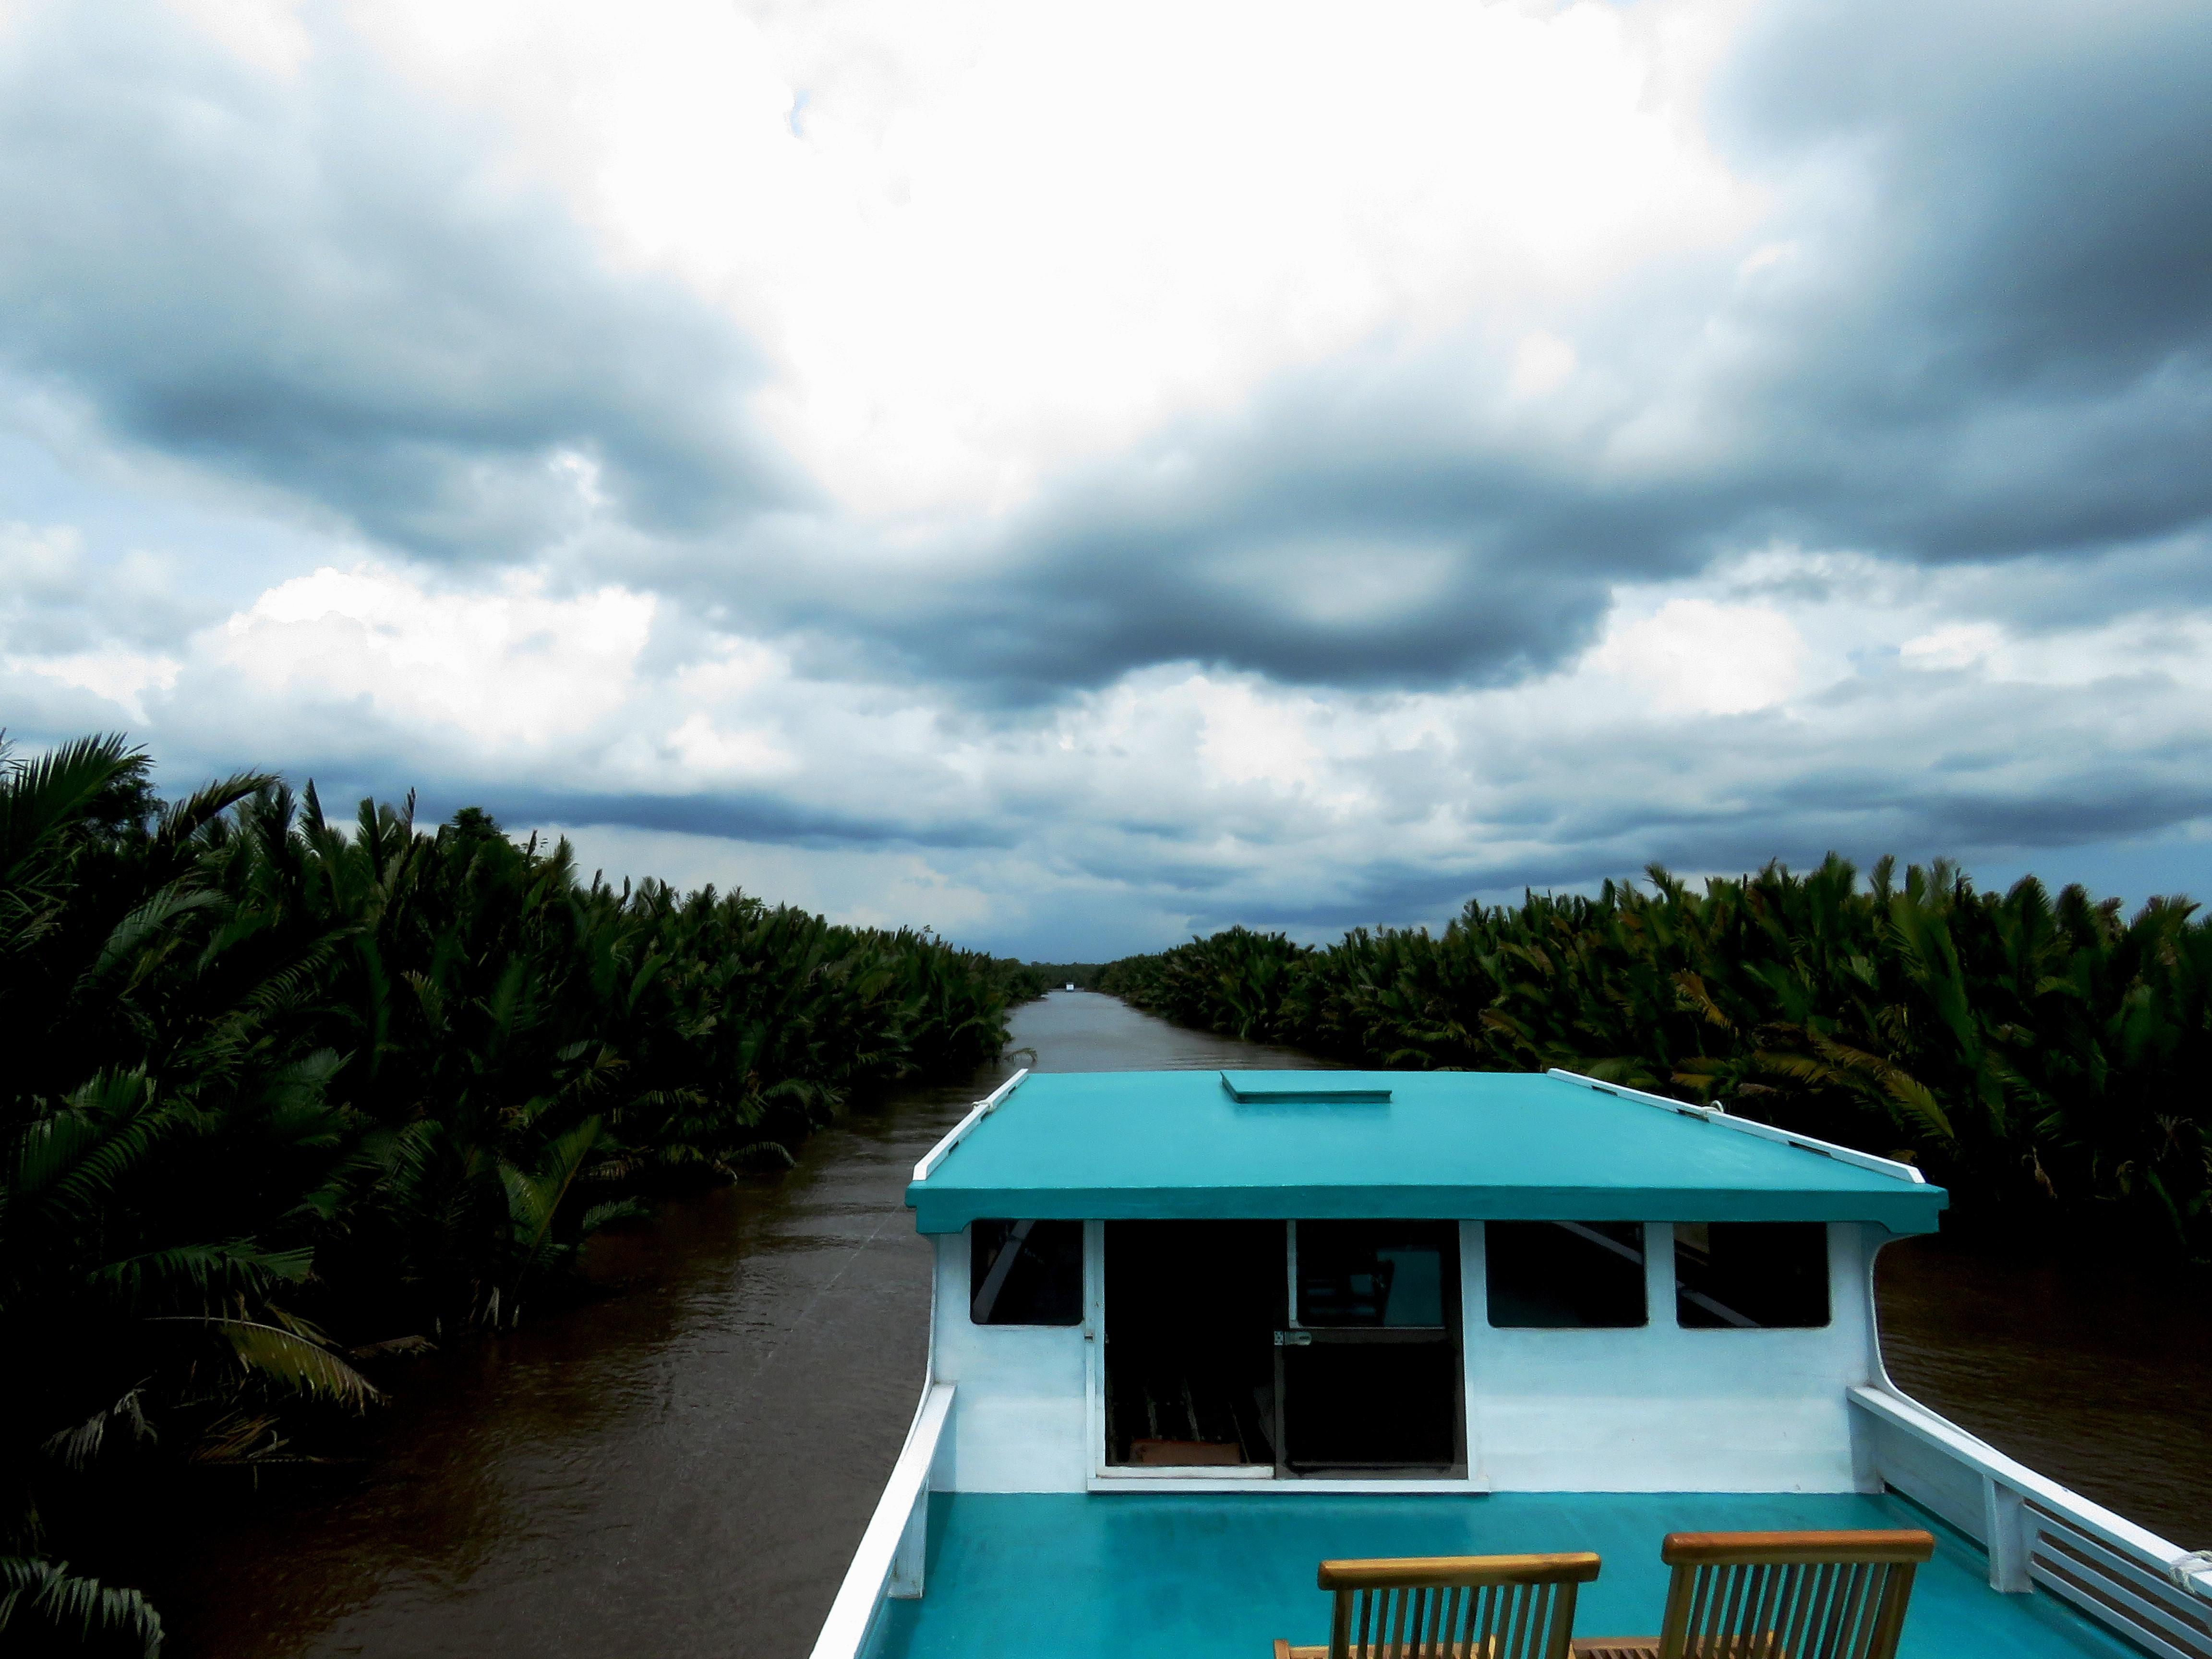 Garuda King Klotok Boat  - Upper open air deck